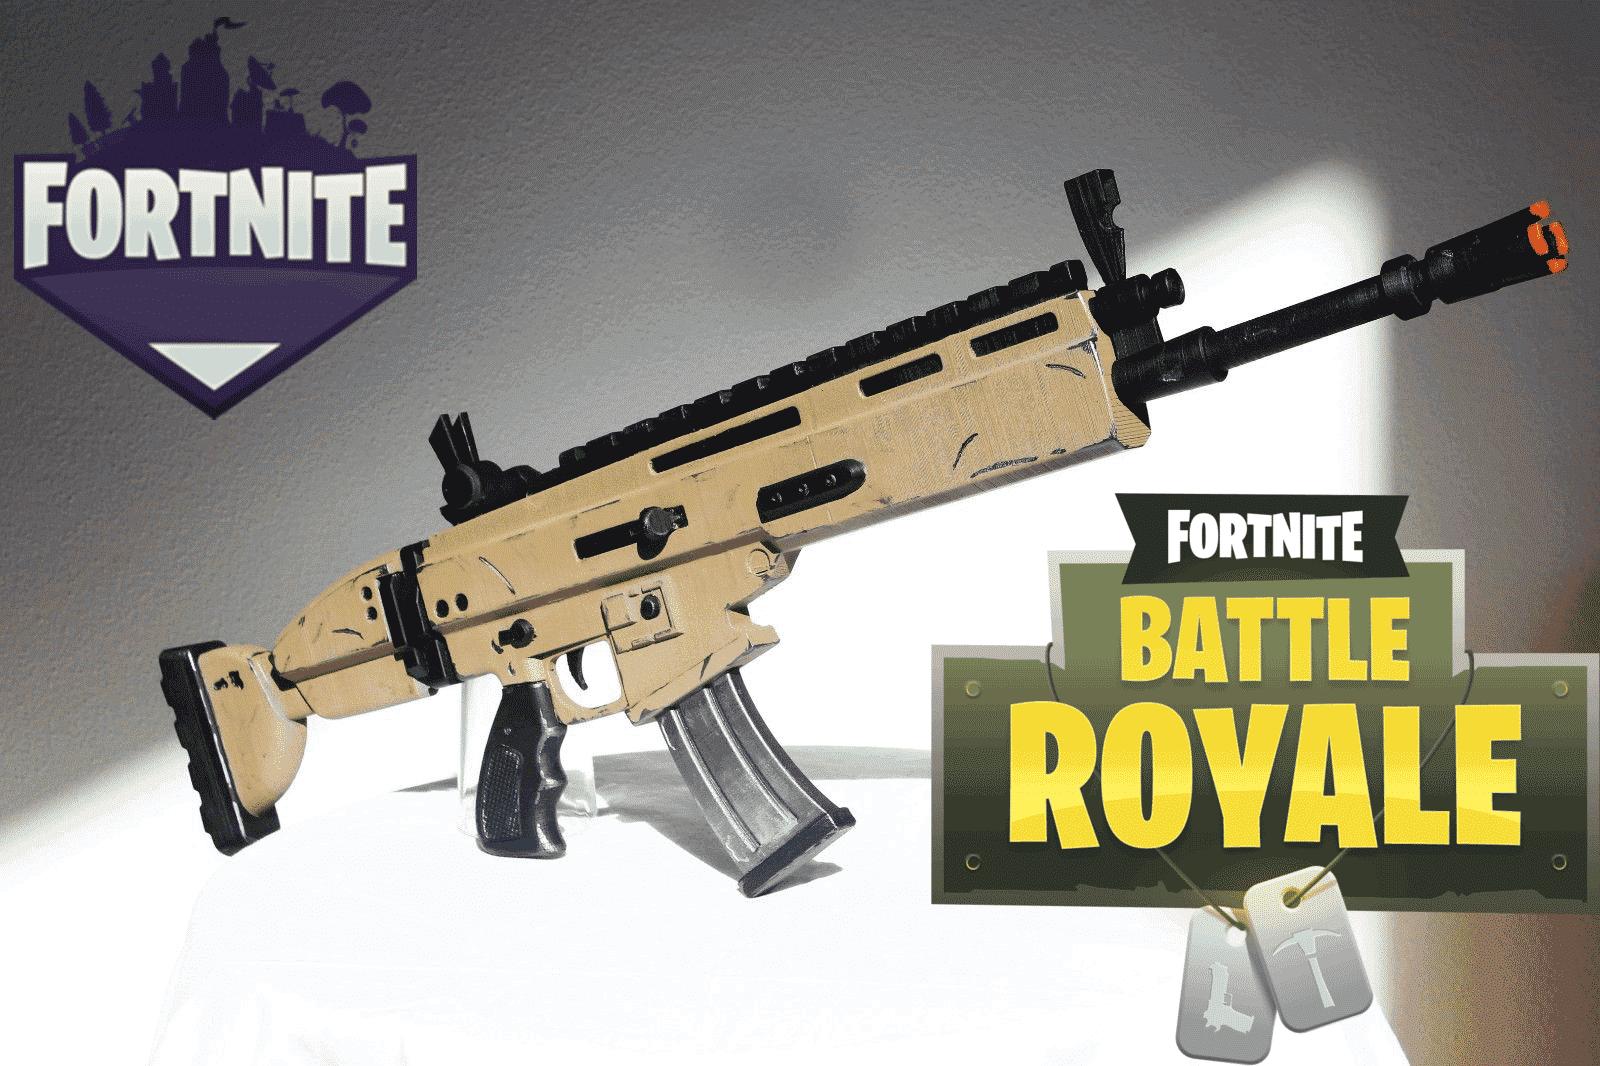 Fortnite-Legendary-Scar-Siegebreaker-Rifle-Machine-Gun-FortNite-Battle